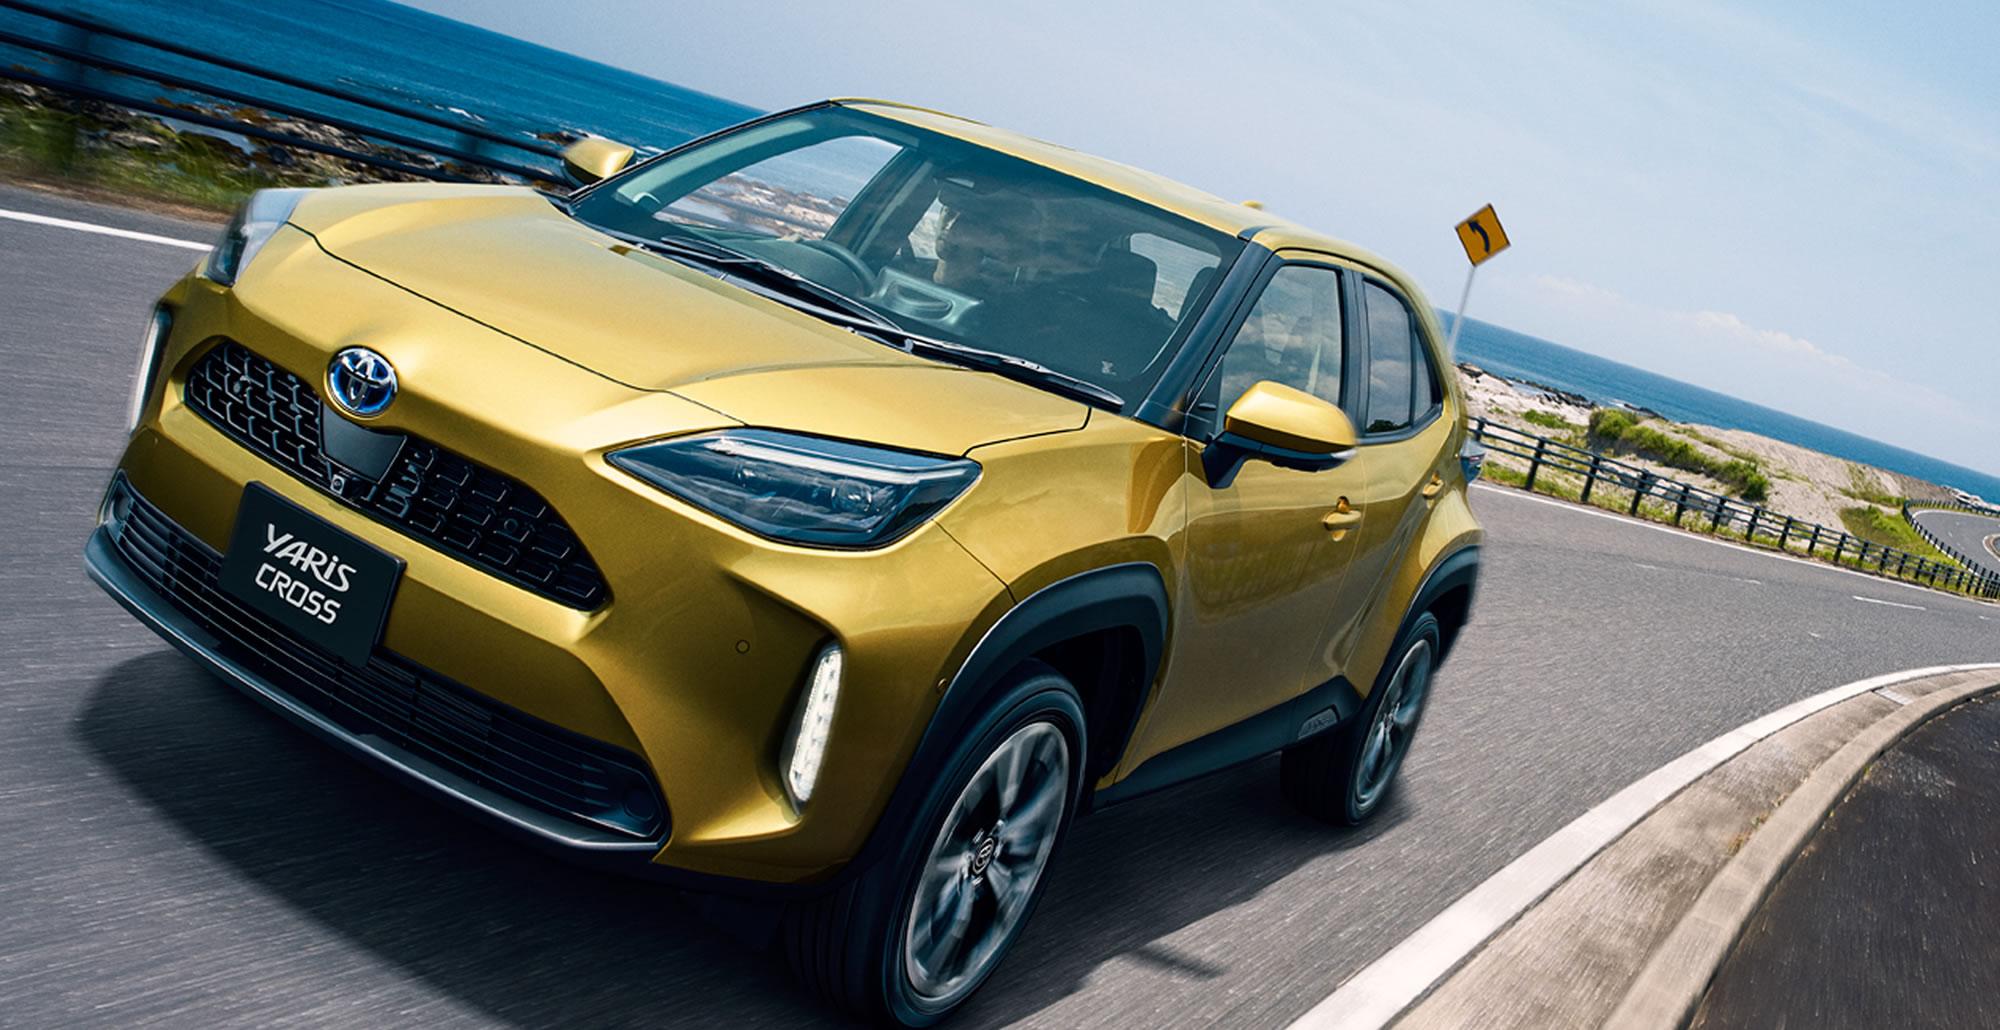 HYBRID Z(2WD)。ボディカラーはブラスゴールドメタリック。オプション装着車。写真はプロトタイプモデルで、量産モデルとは一部仕様が異なる場合があります。